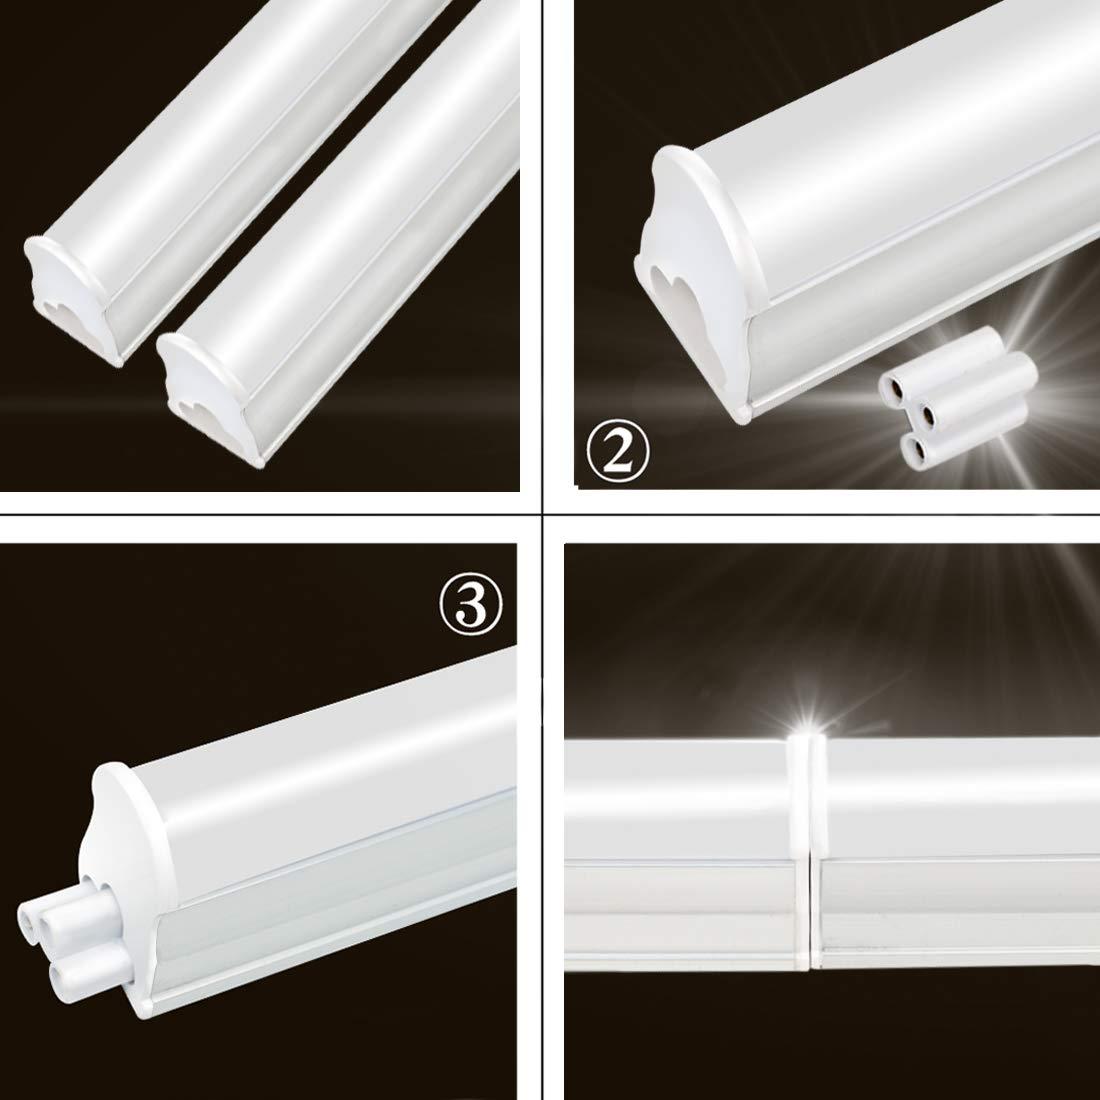 3FT Tubos Fluorescentes LED Lámpara 4000K 1125LM T5 Lámparas Lluminación Gabinete Interior Luces Bar Garaje Sala de Conferencias Oficina Escuela Hospital ...